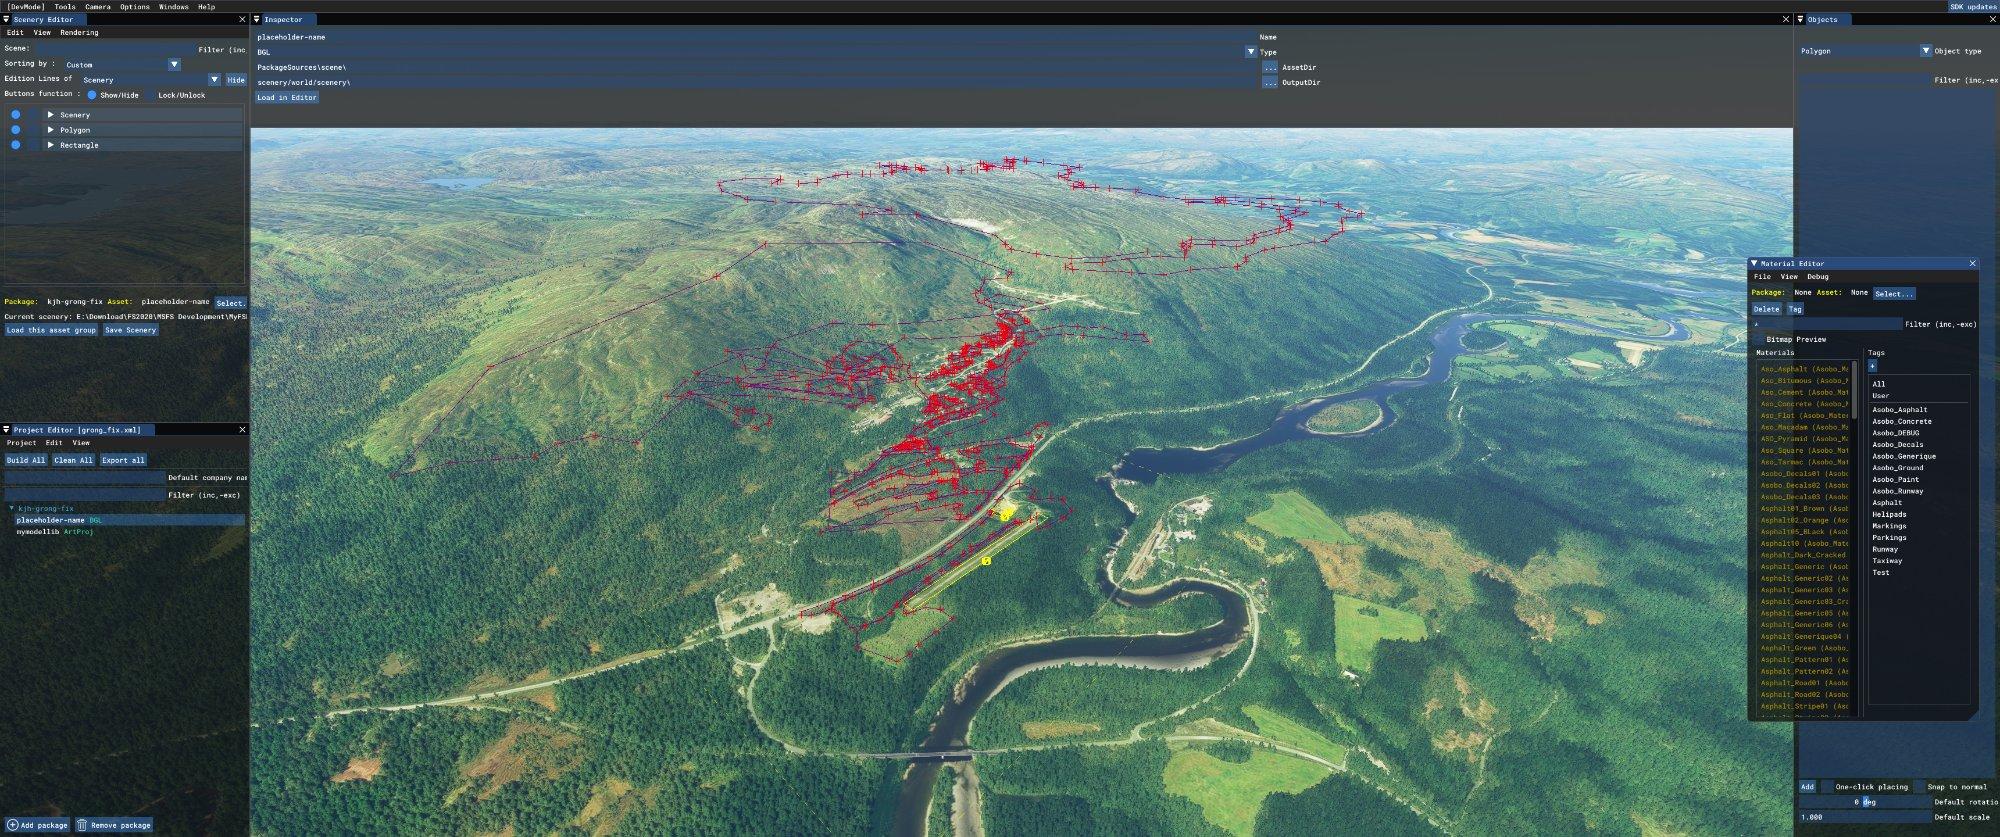 Microsoft Flight Simulator Screenshot 2021.04.27 - 09.57.57.99.jpg